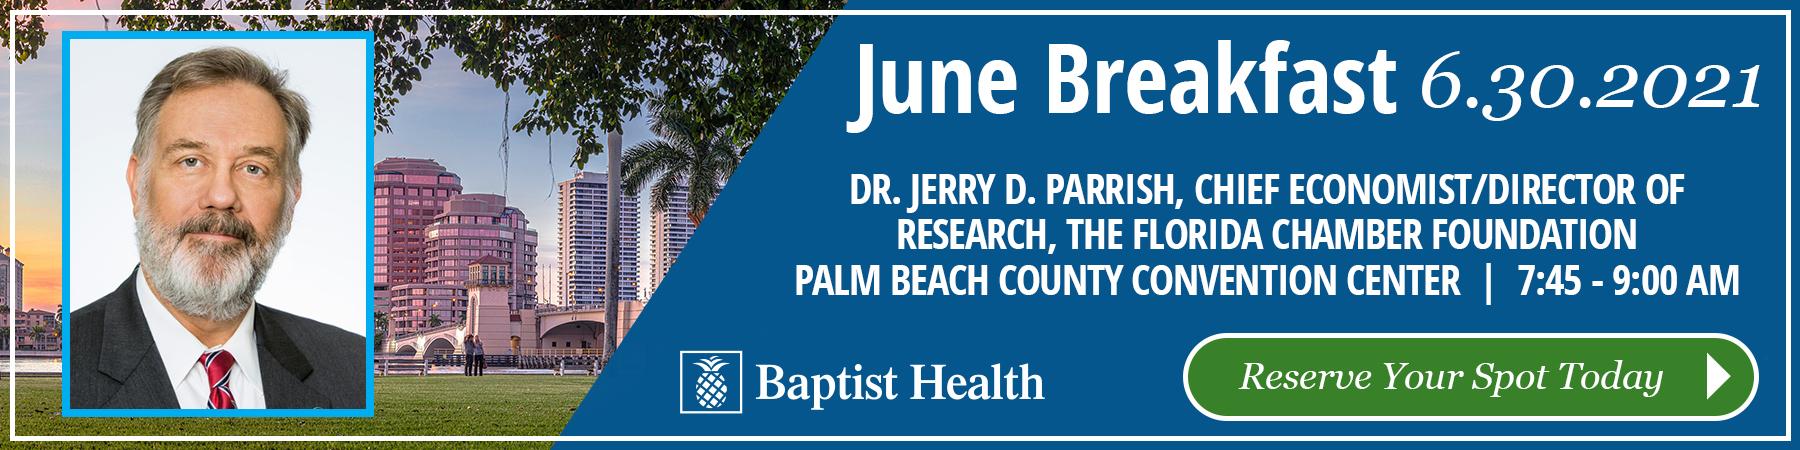 June_Breakfast_Dr Jerry Parrish_WebBanner_6-30-2021